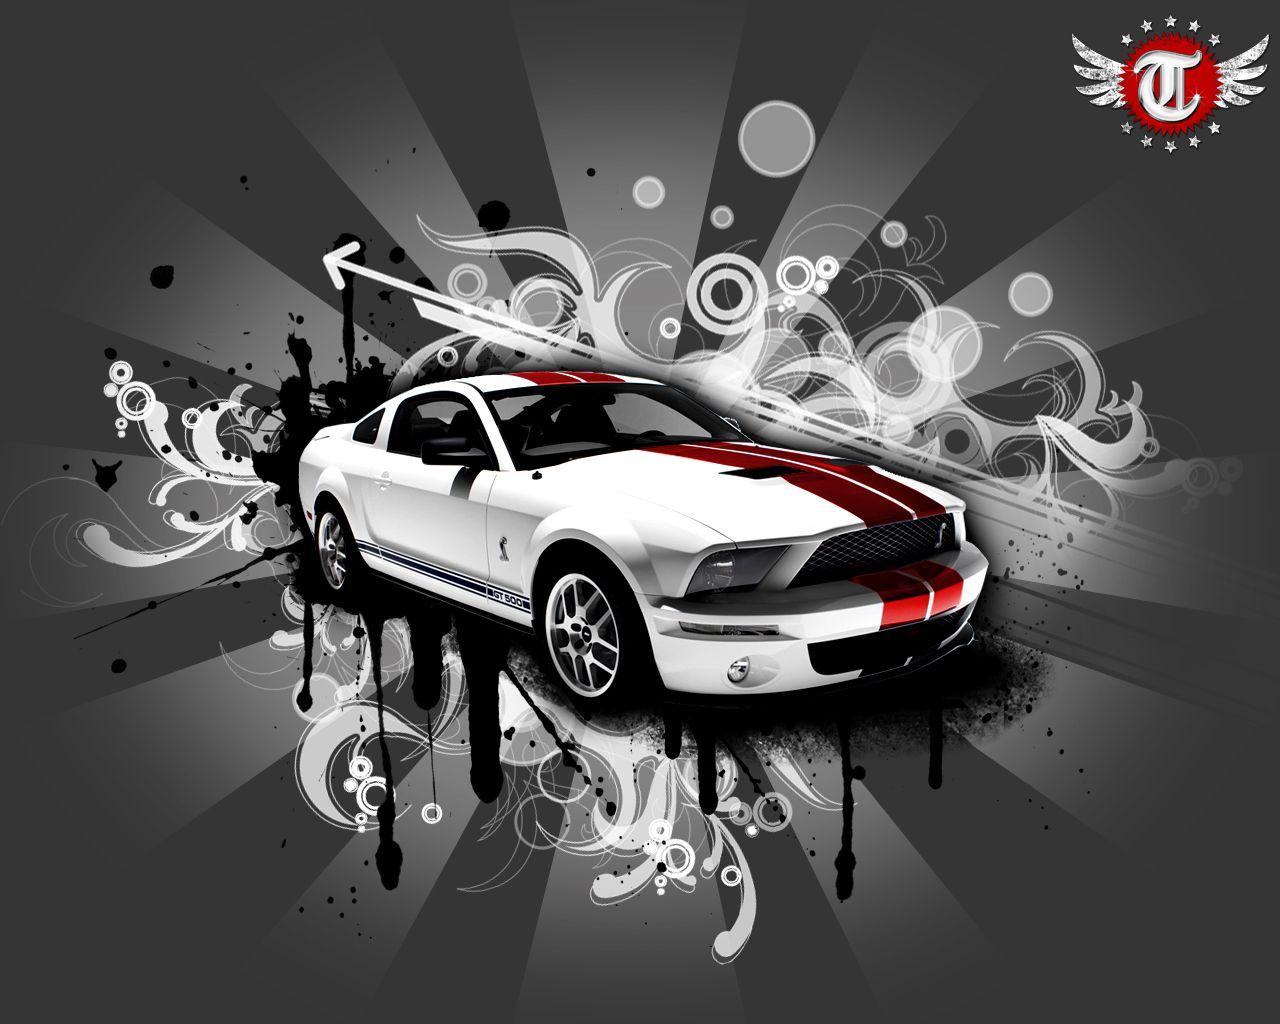 Fotos De Carros Carros Tunados Wallpapers Carros